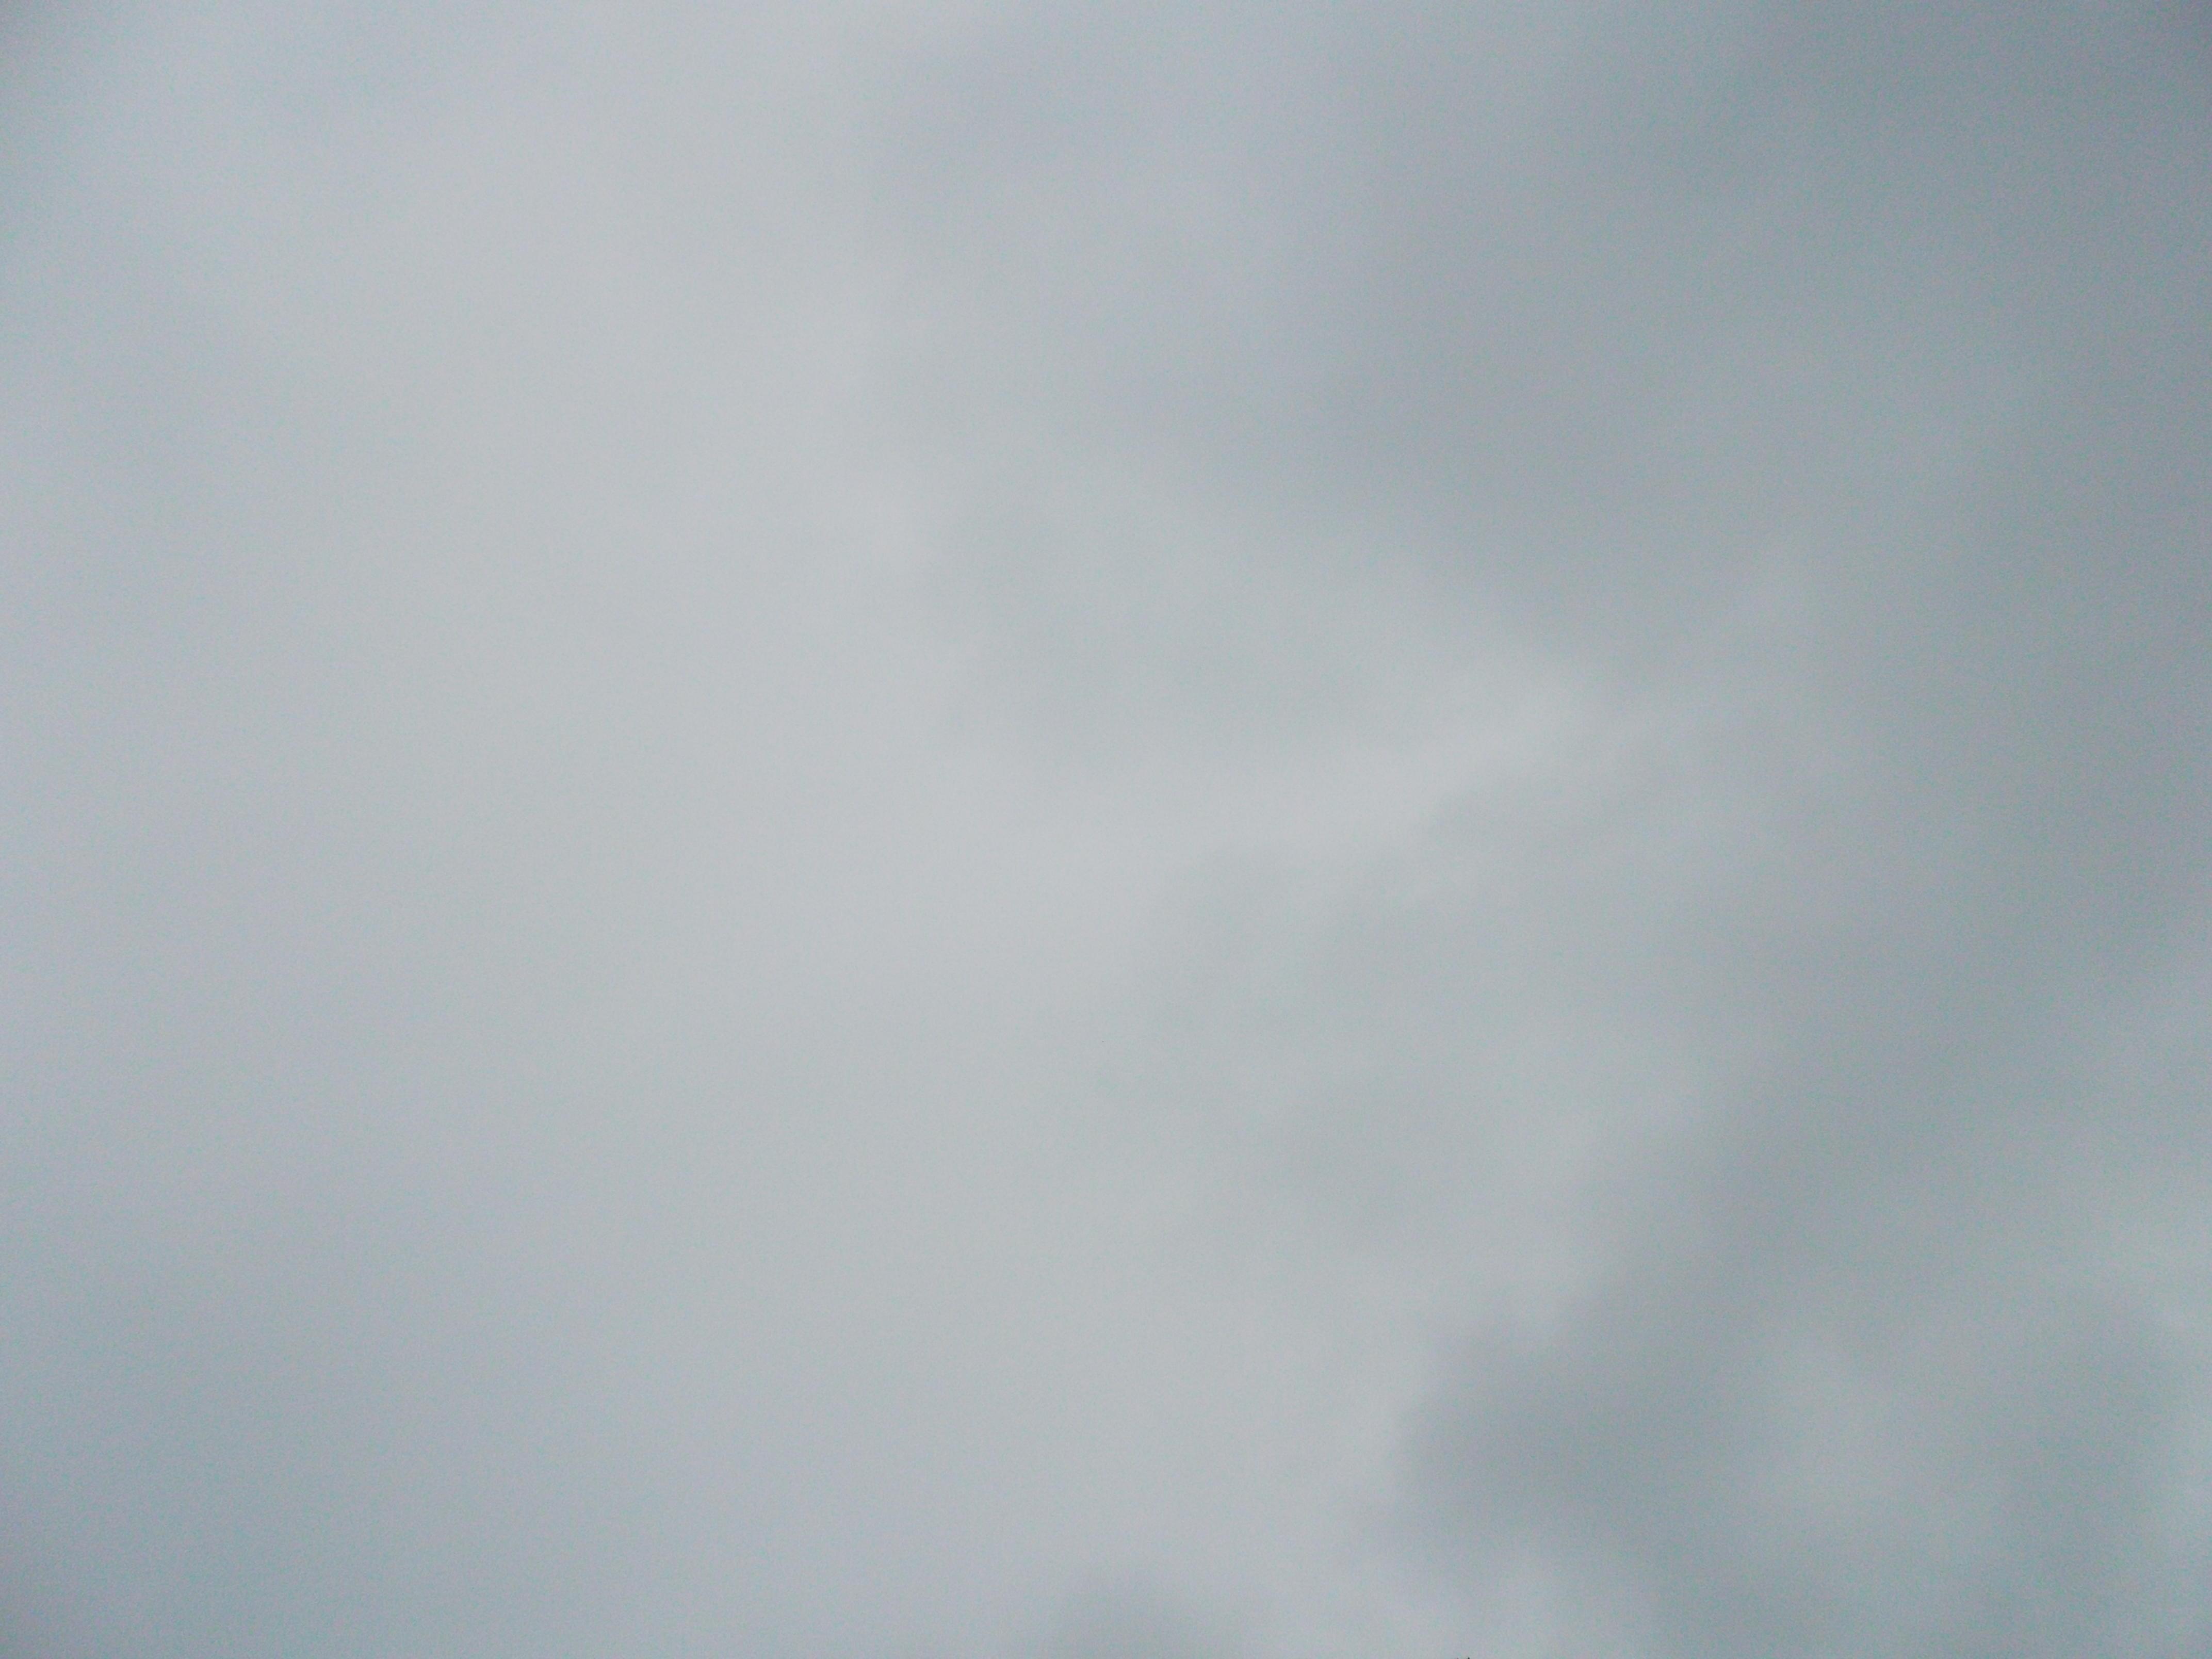 2013-06-09 Longitude -0.371 Latitude 49.182 Altitude 29 Heure 11h10